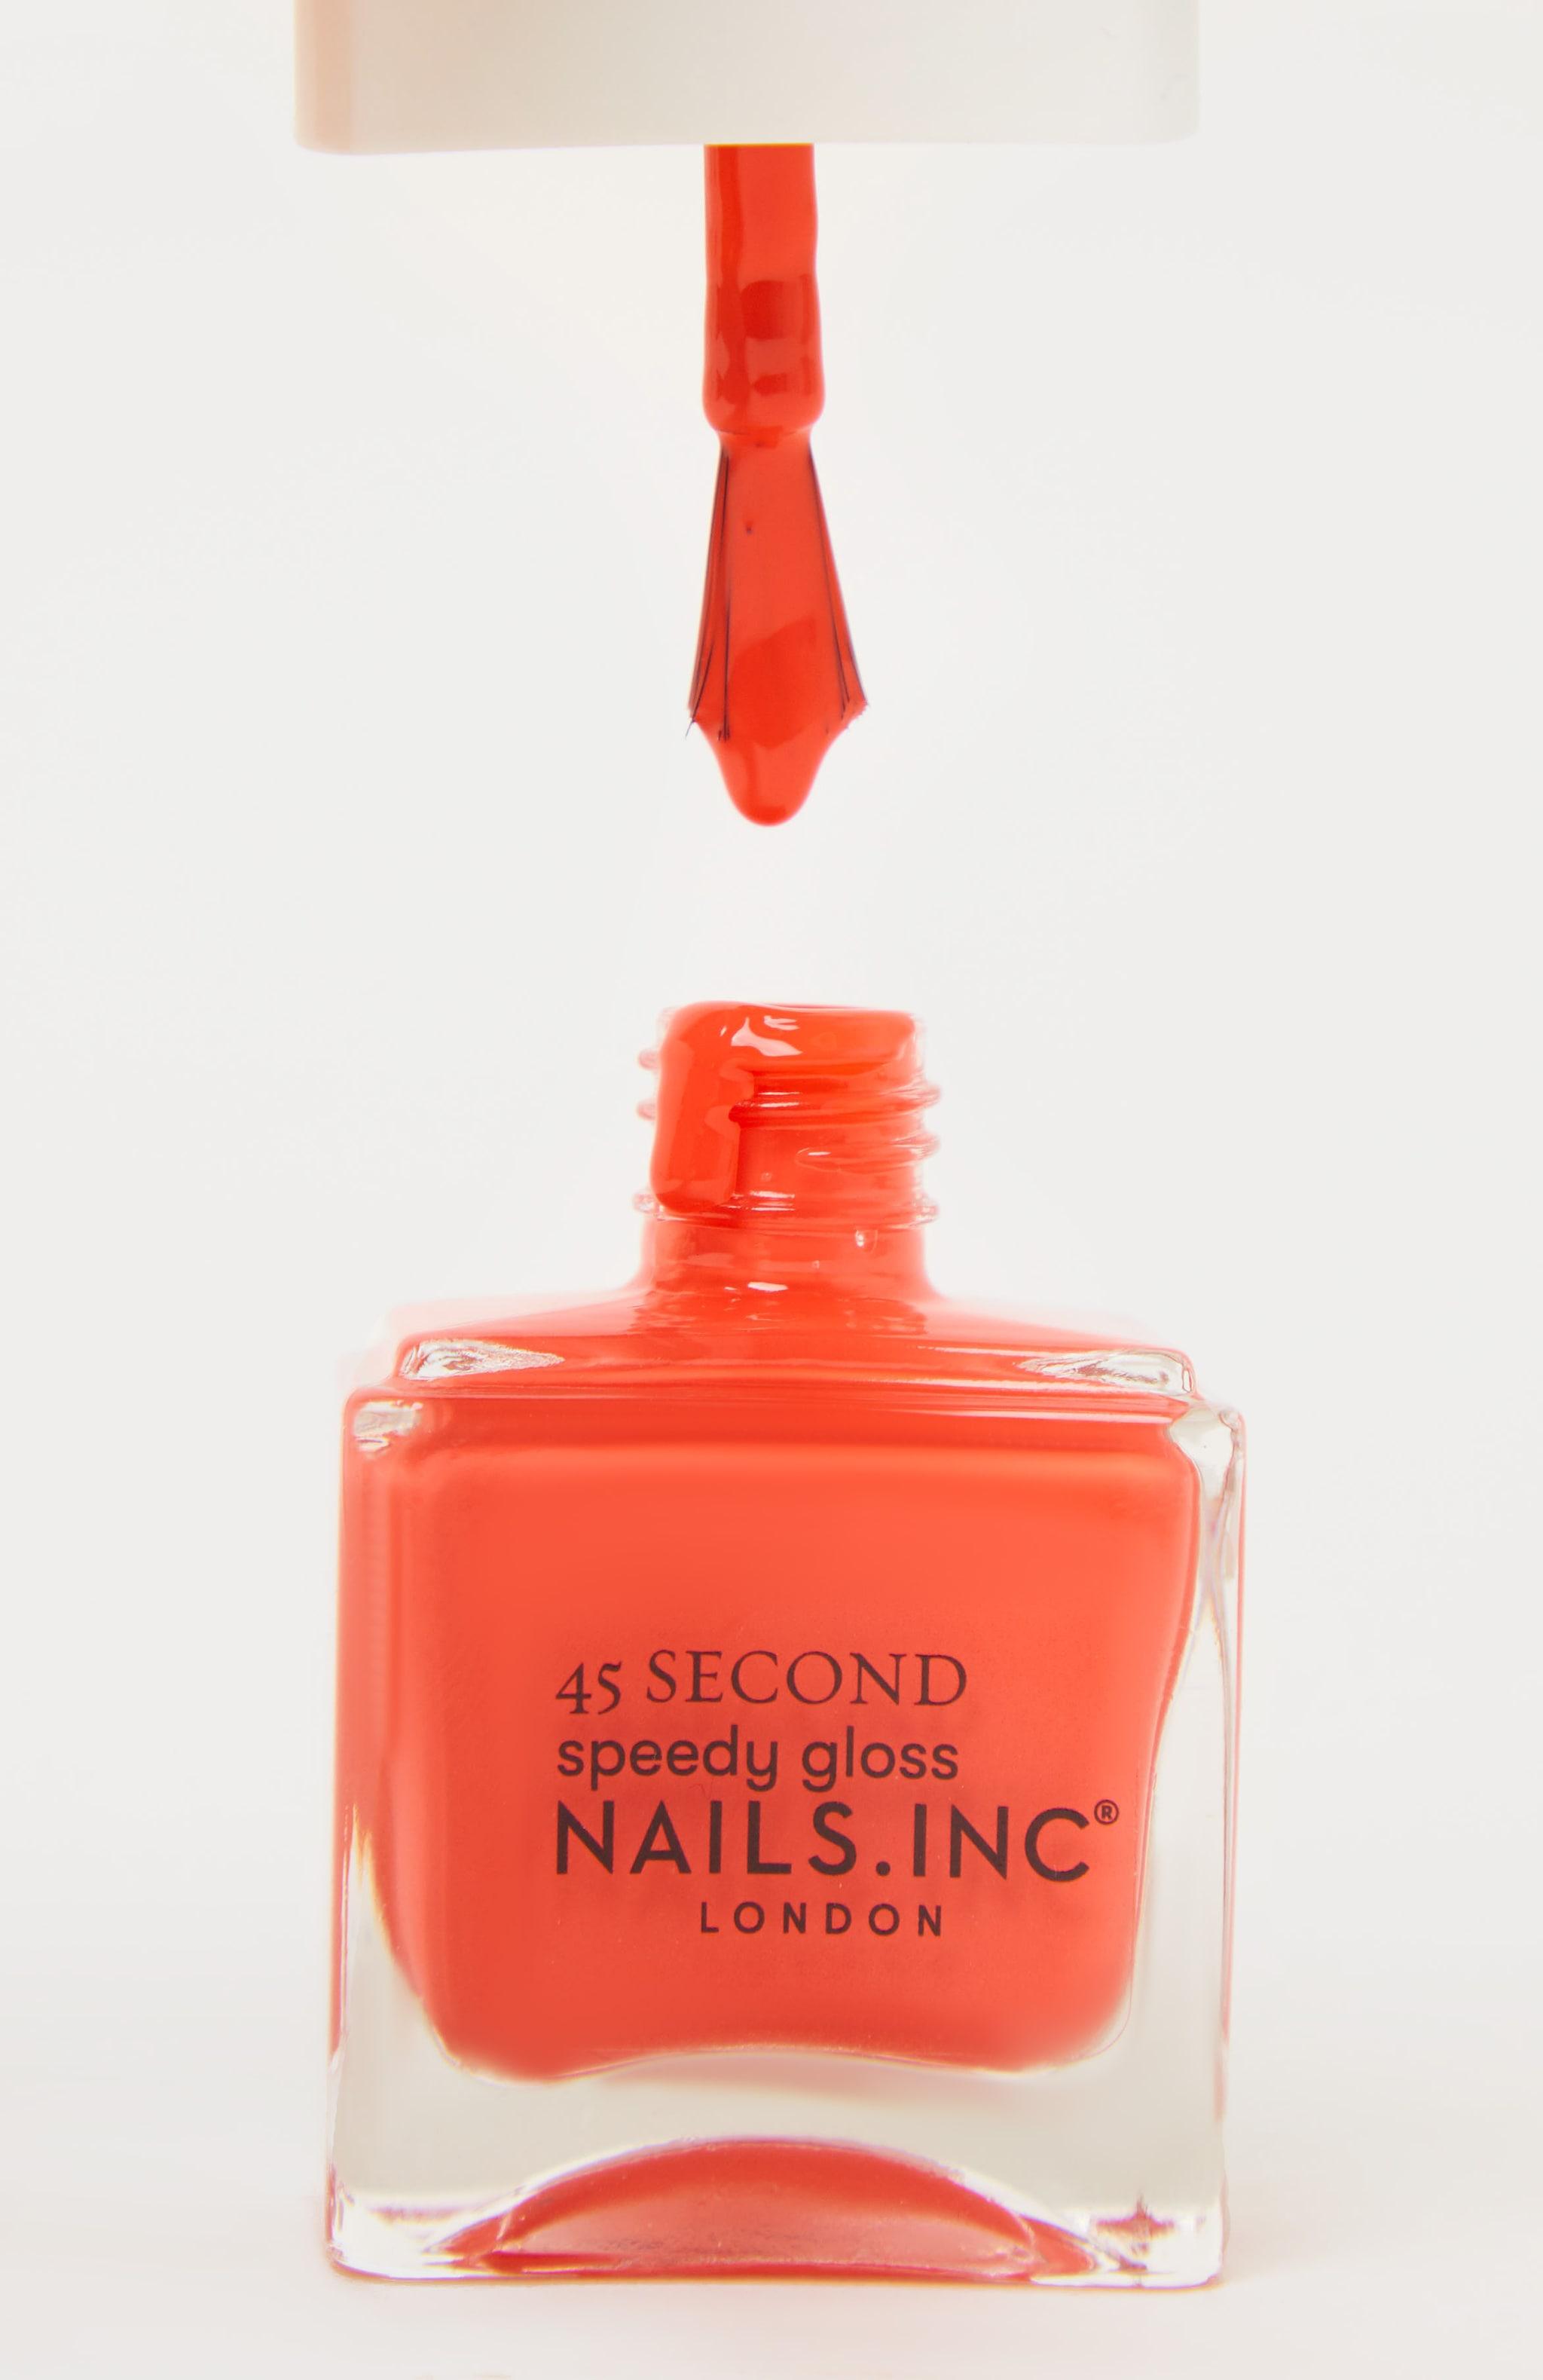 Nails Inc 45 Second Speedy Gloss Browsing On Bond Street 2